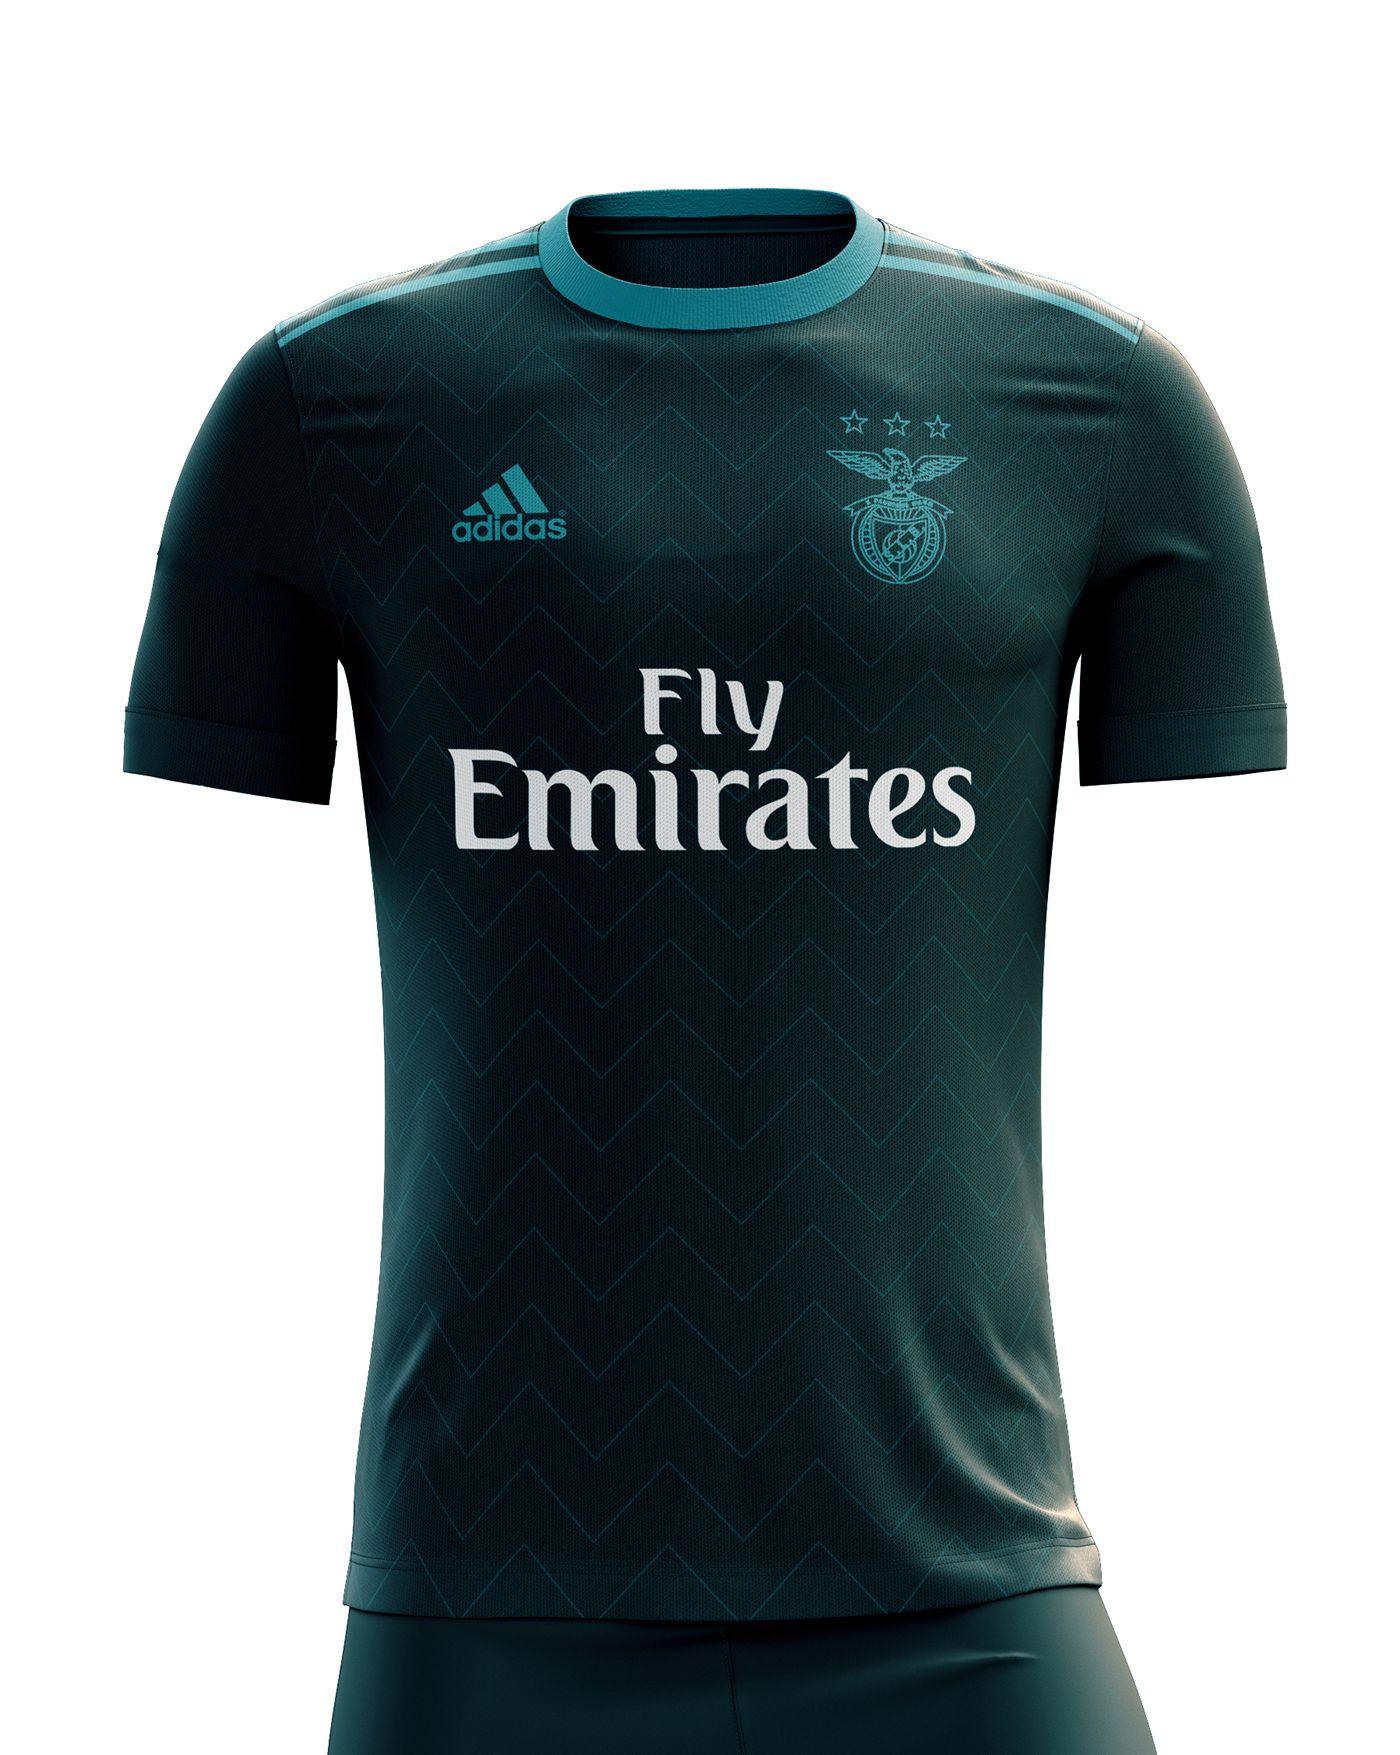 SL Benfica Football Kit 17 18. on Behance  bcb774ef2